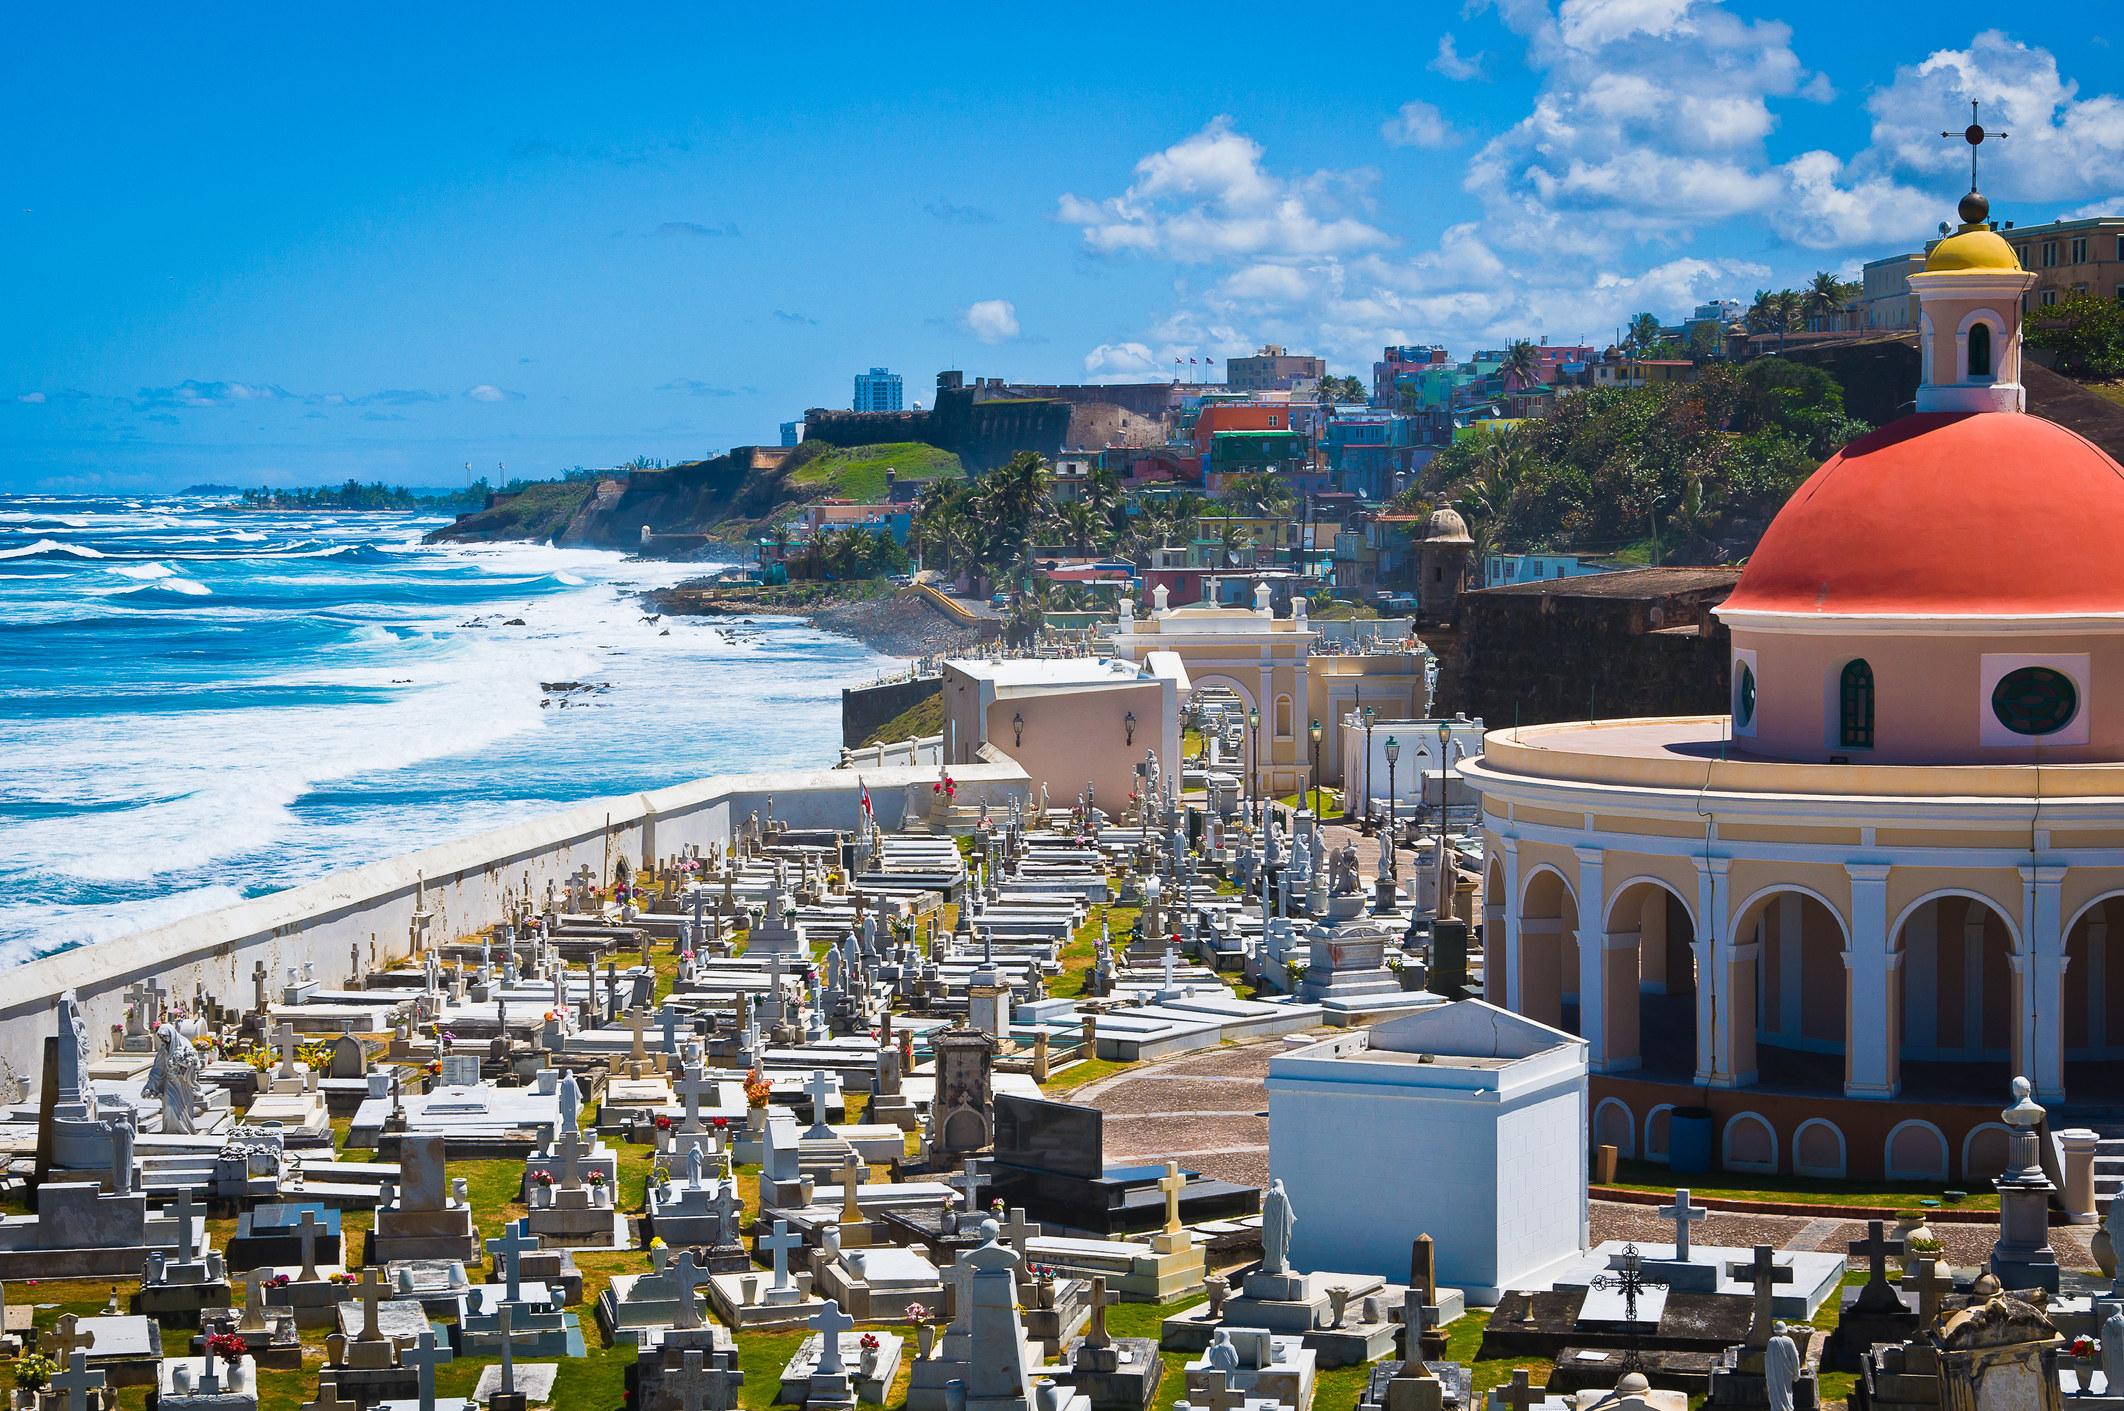 Old San Juan, Puerto Rico by the sea.